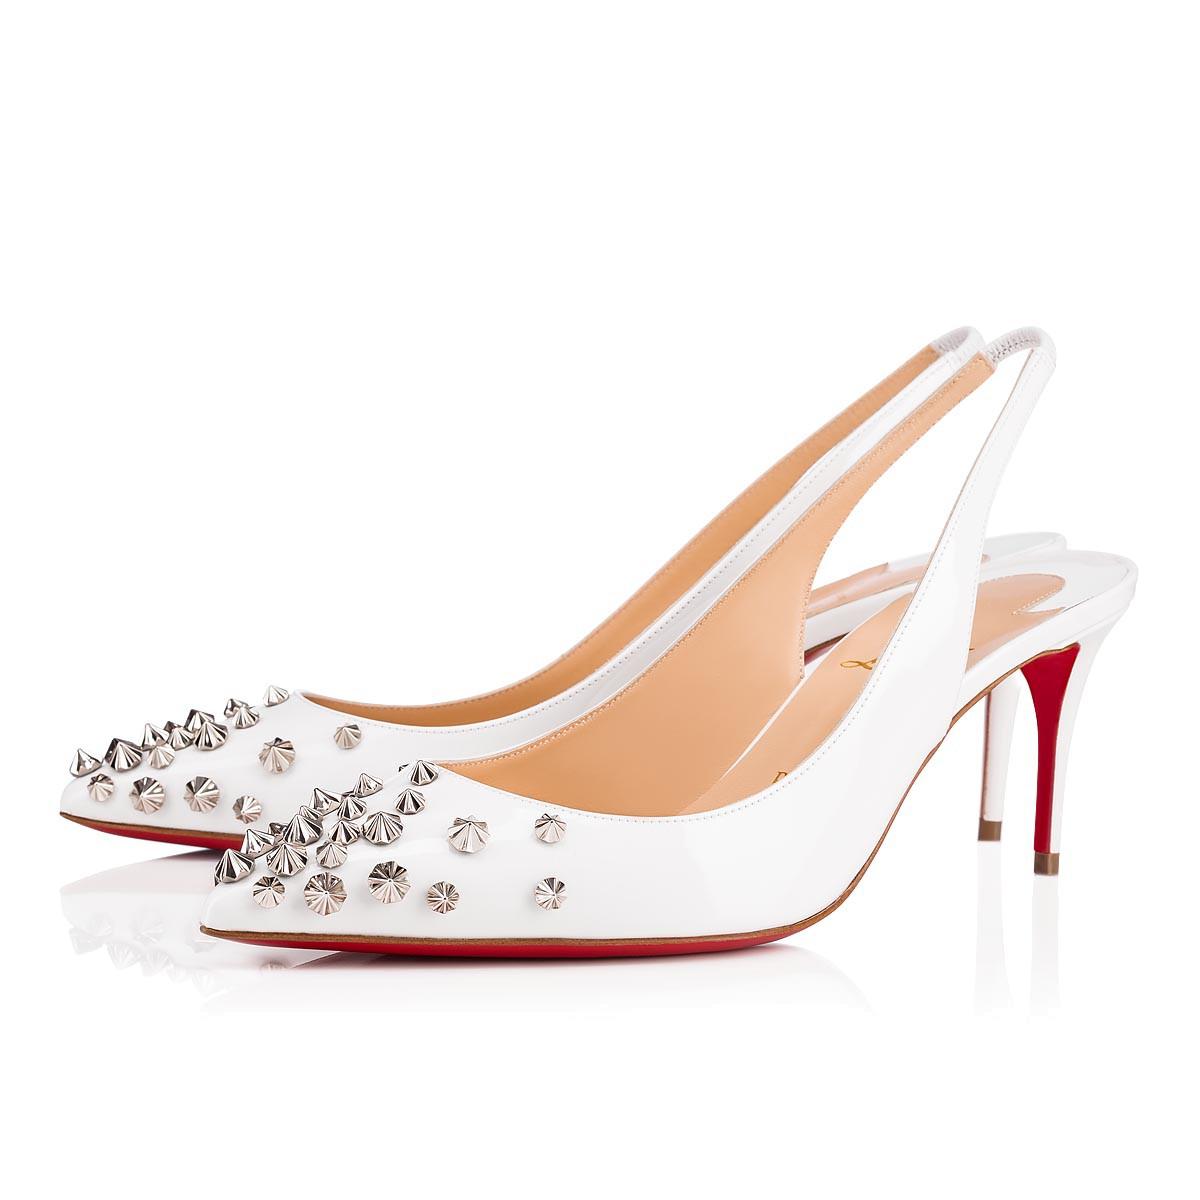 size 40 c03dc 85d8f DRAMA SLING 70 LATTE/SILVER Patent - Women Shoes - Christian Louboutin